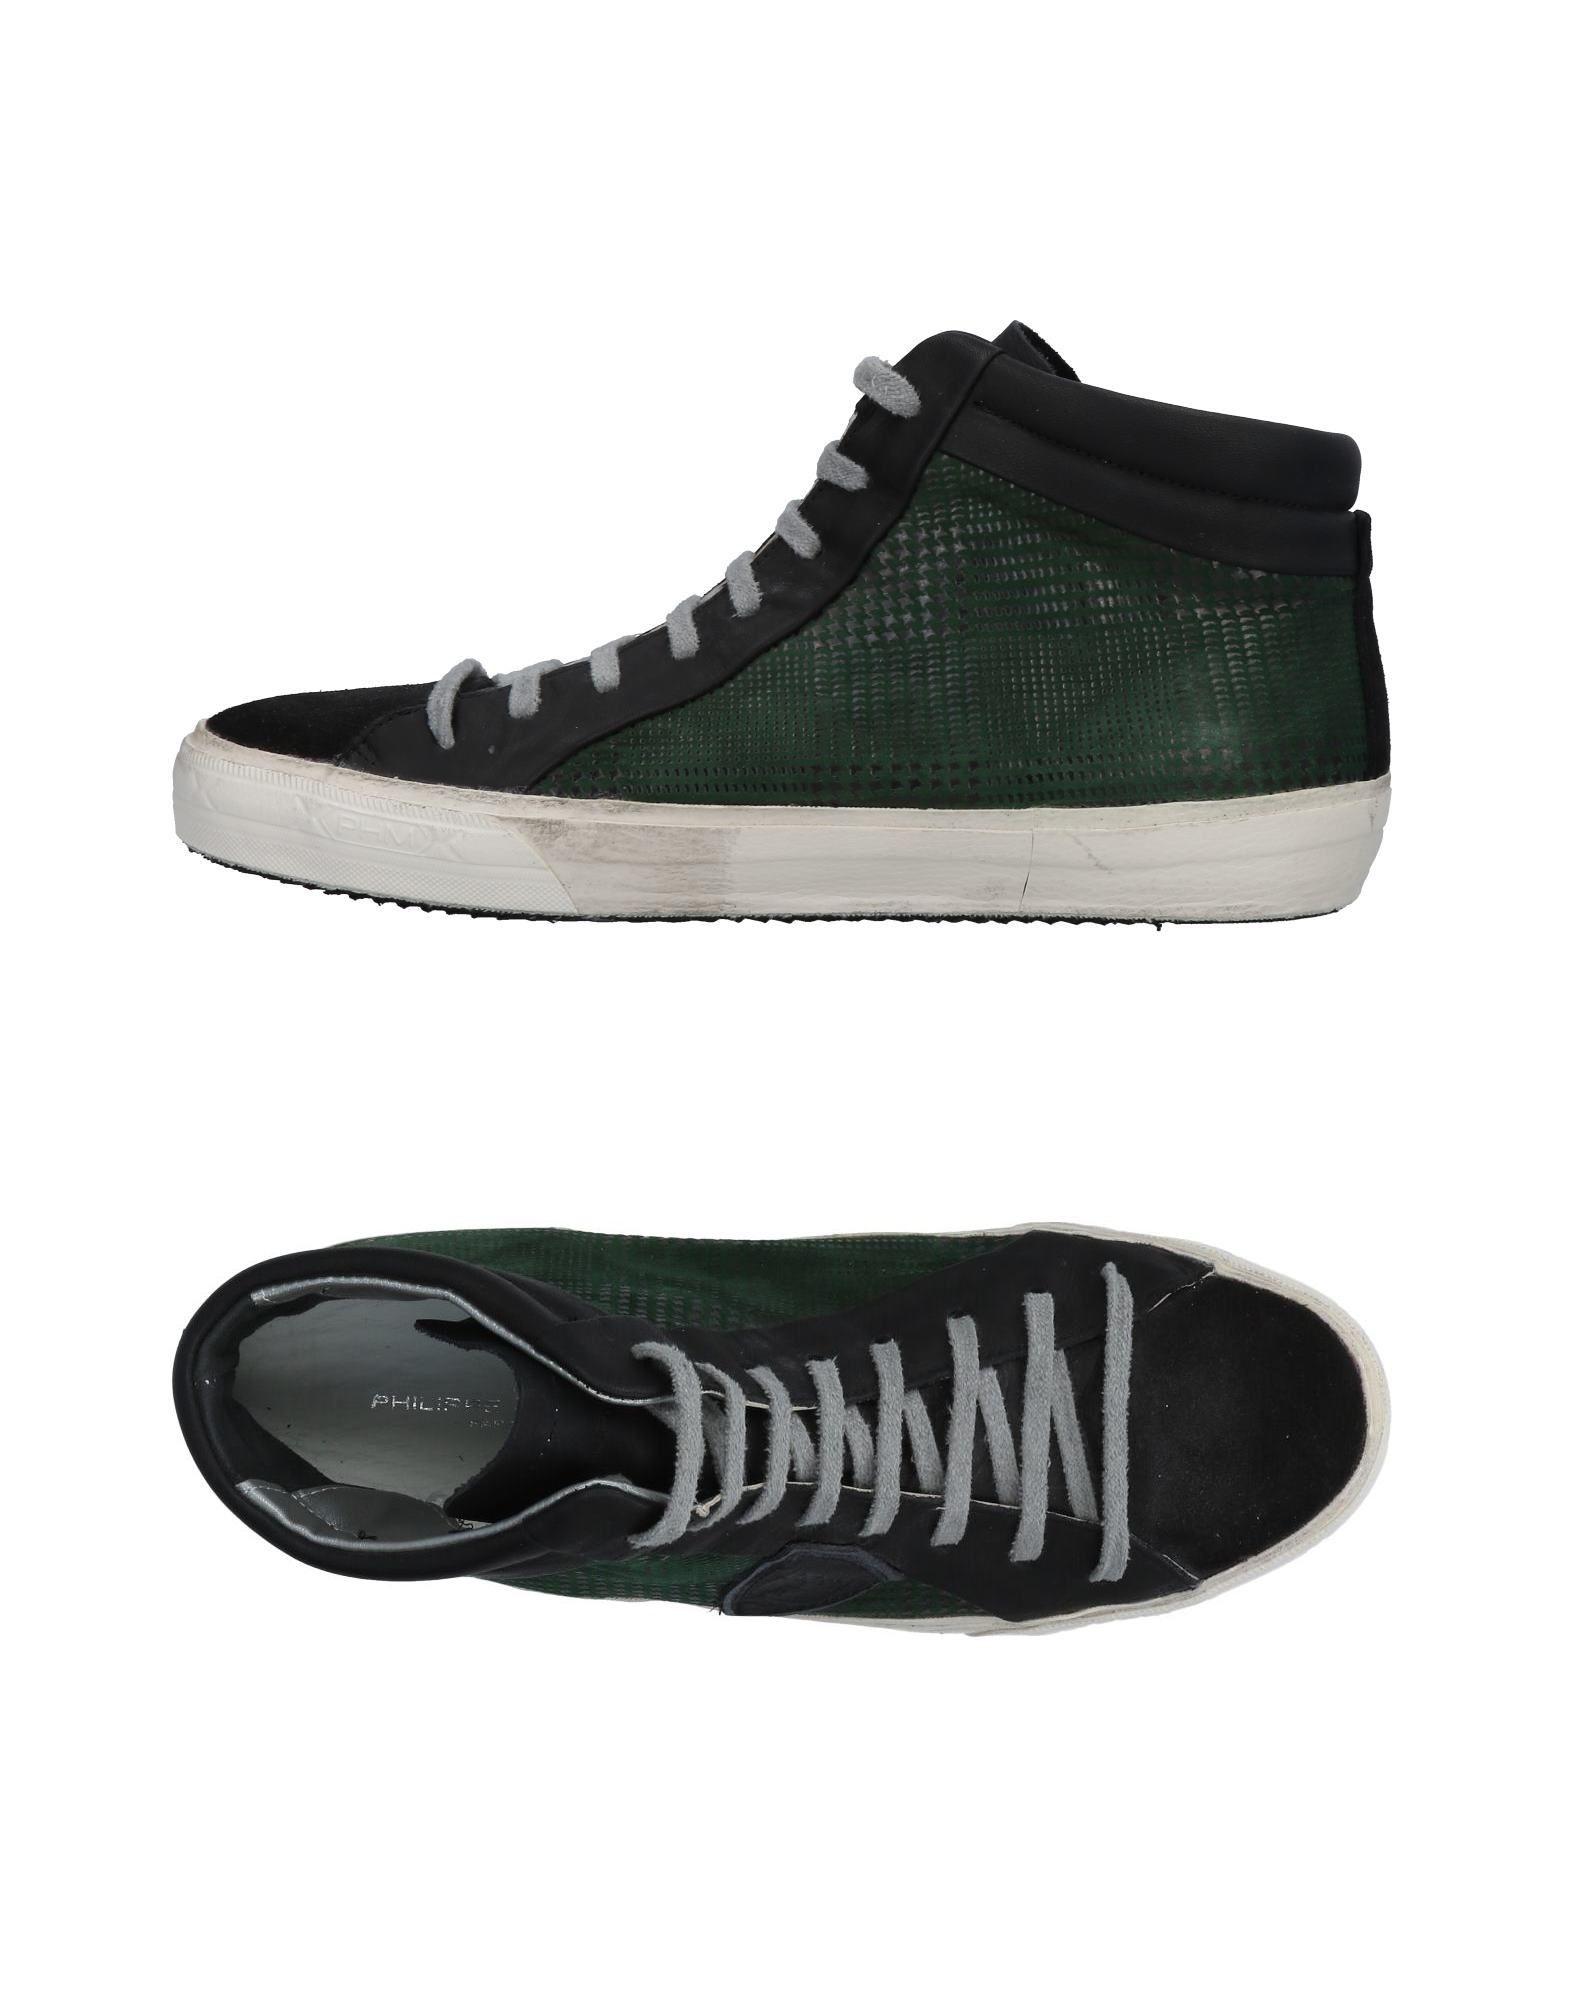 Philippe Model Model Sneakers - Men Philippe Model Model Sneakers online on  Australia - 11485371SU 395093